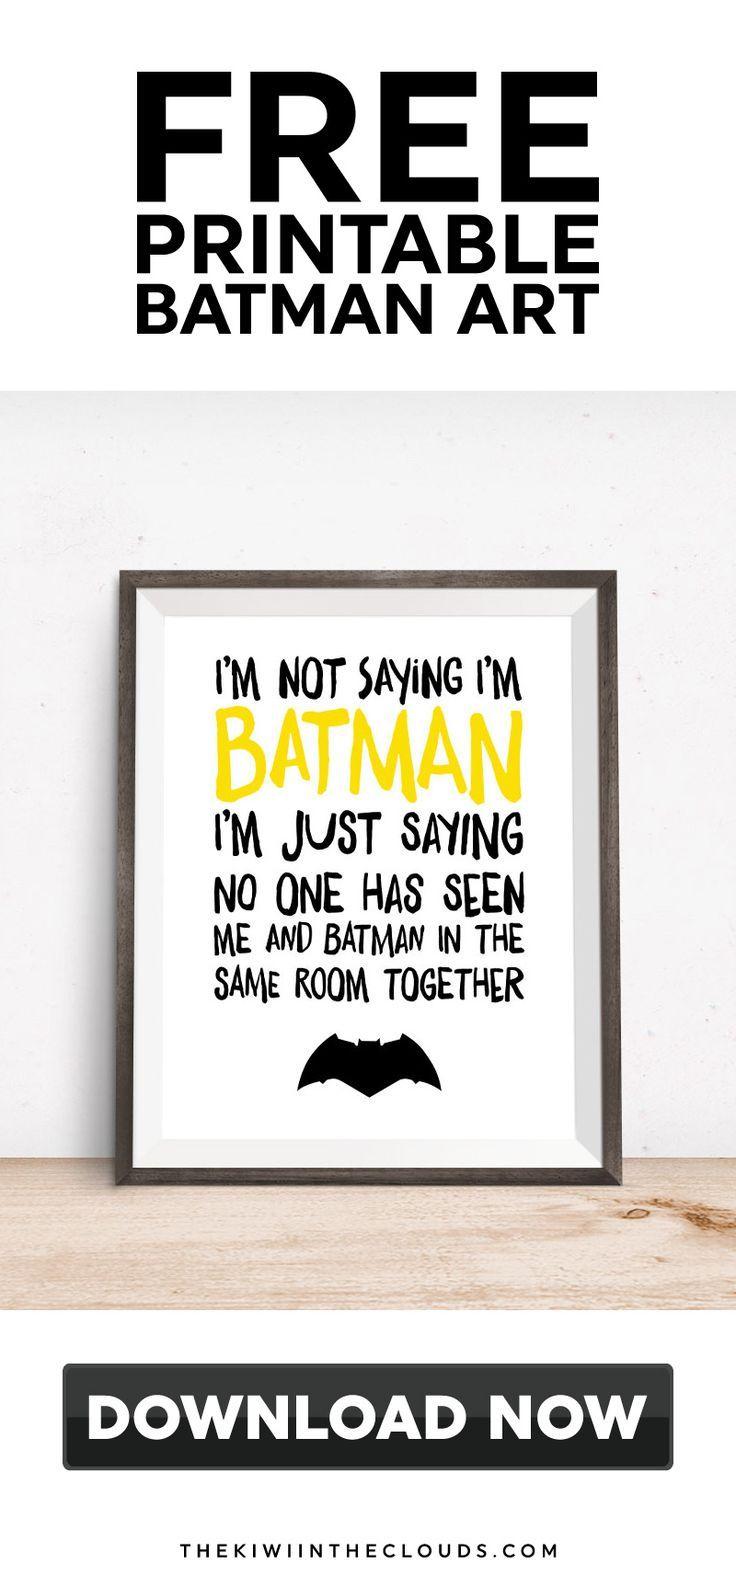 Superhero Room Design: How To Make A Modern Batman Boys Room He'll Love Spending